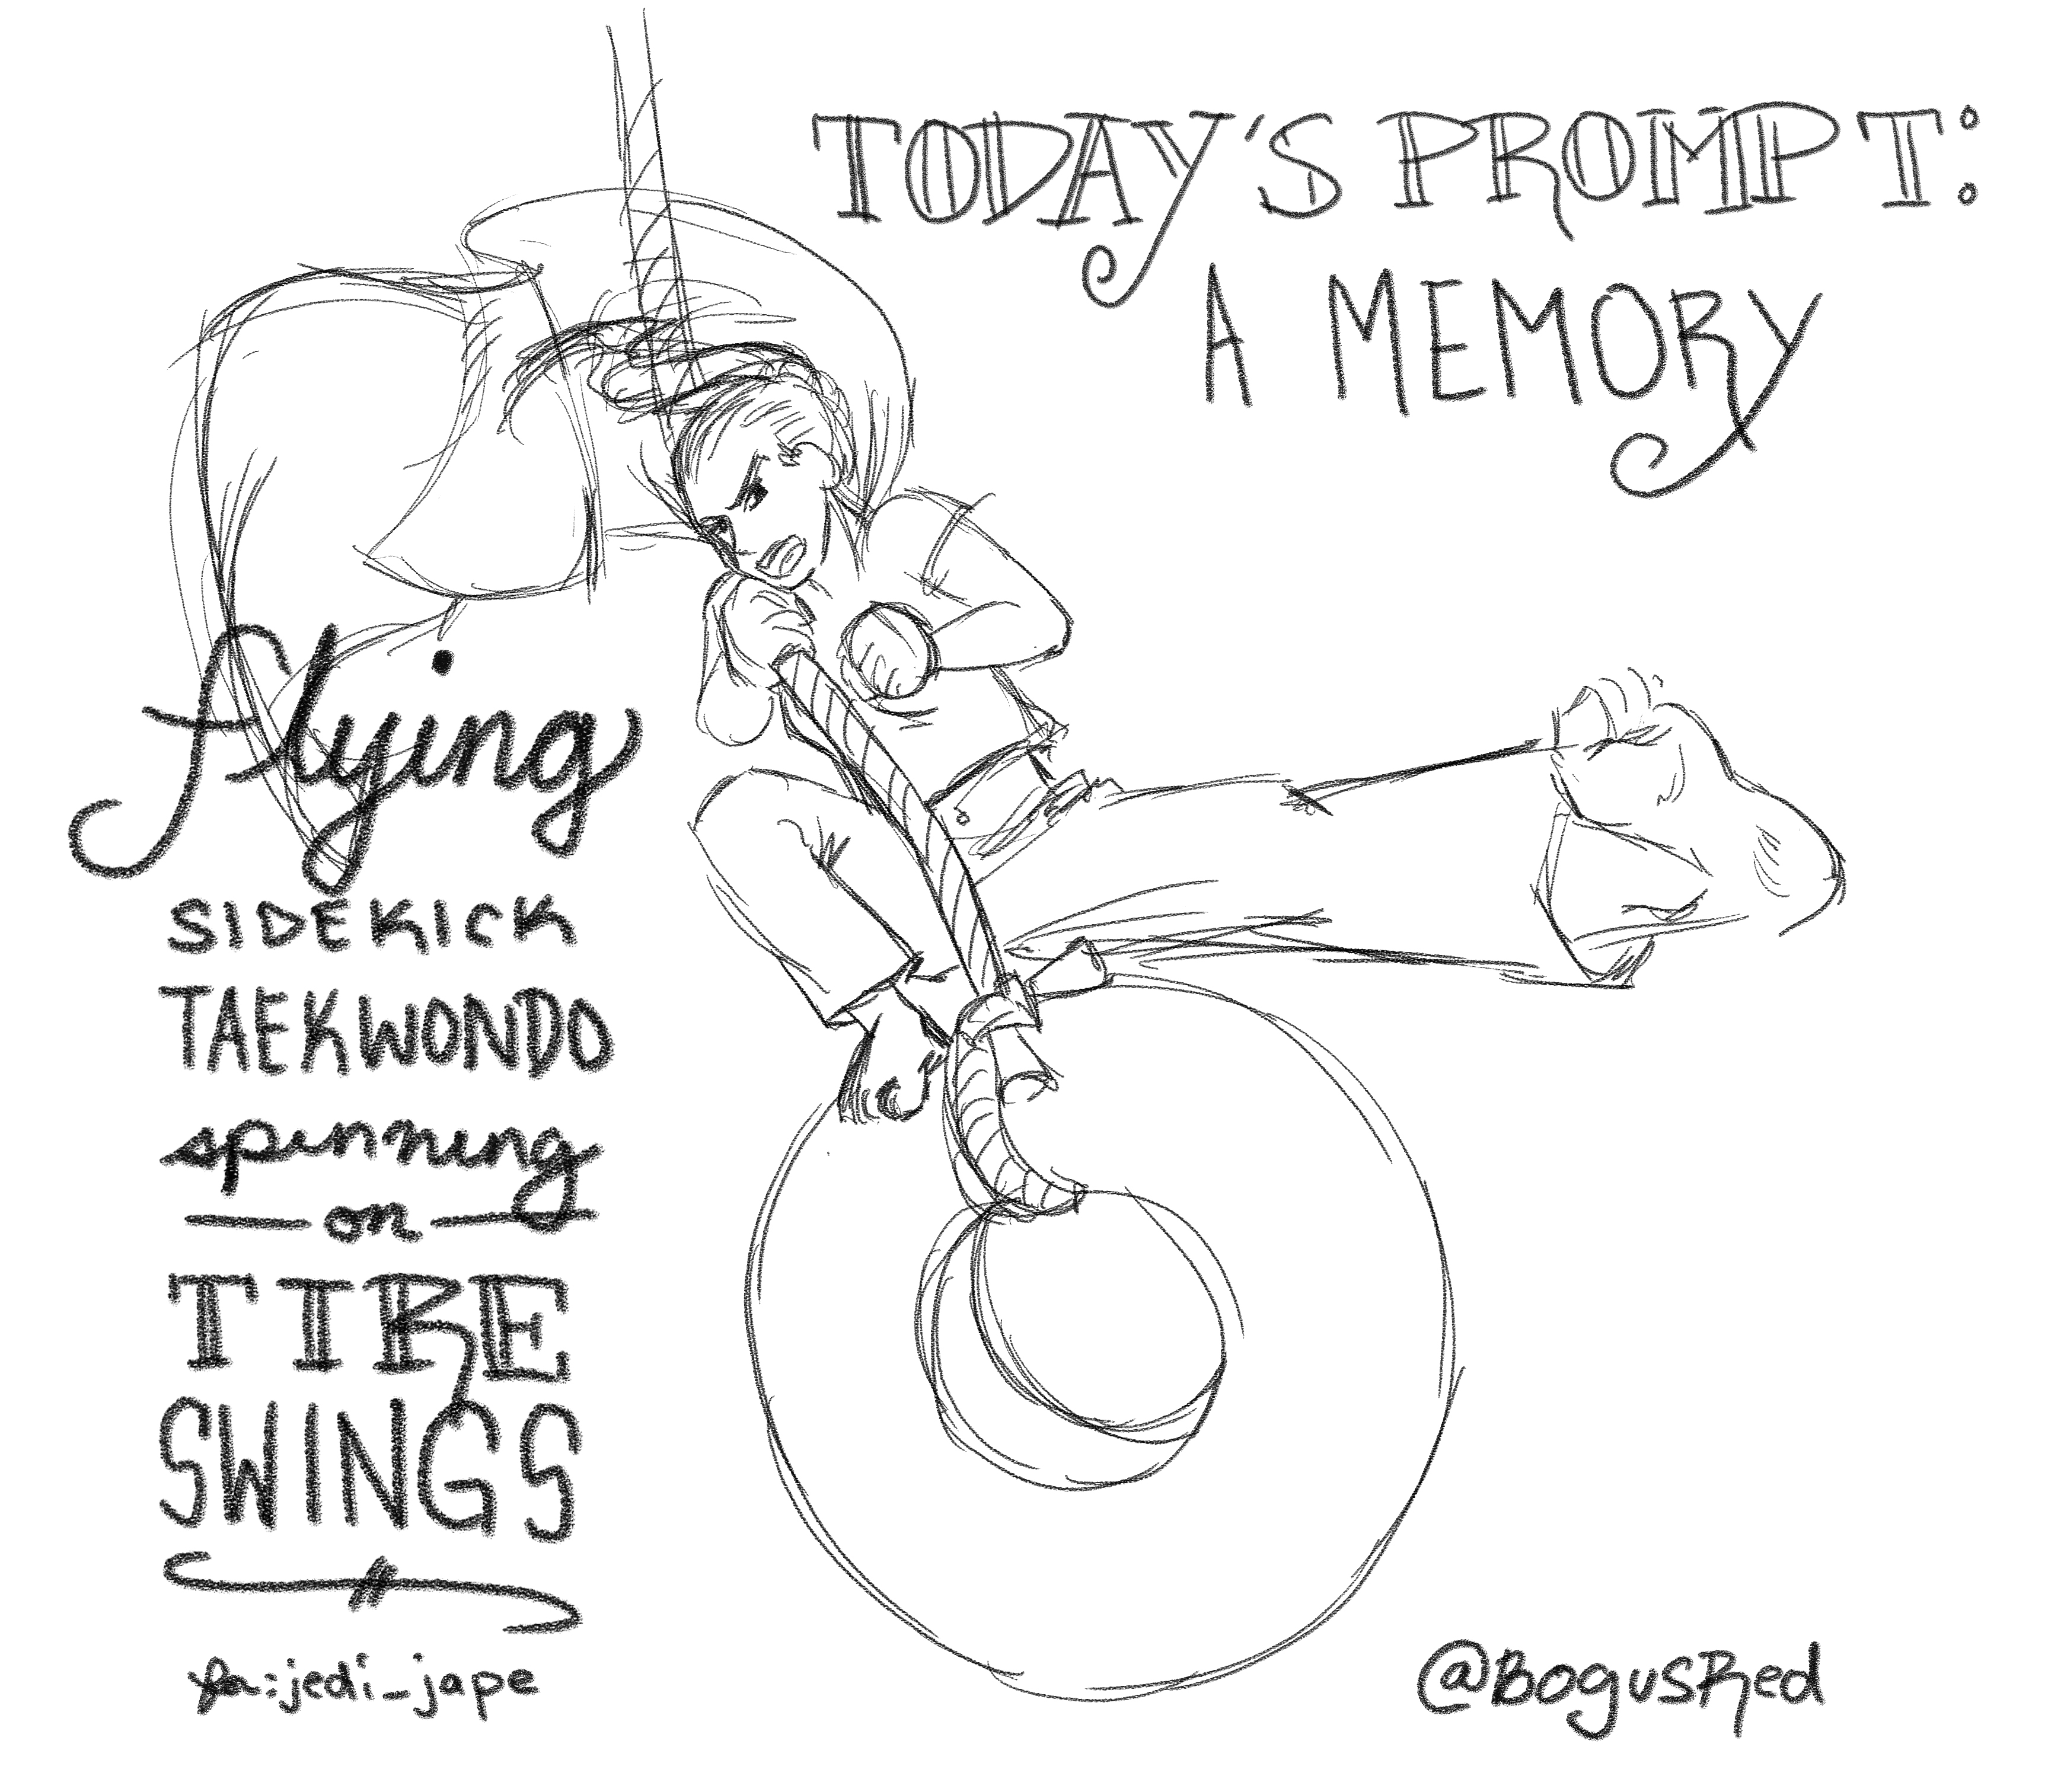 A memory 1